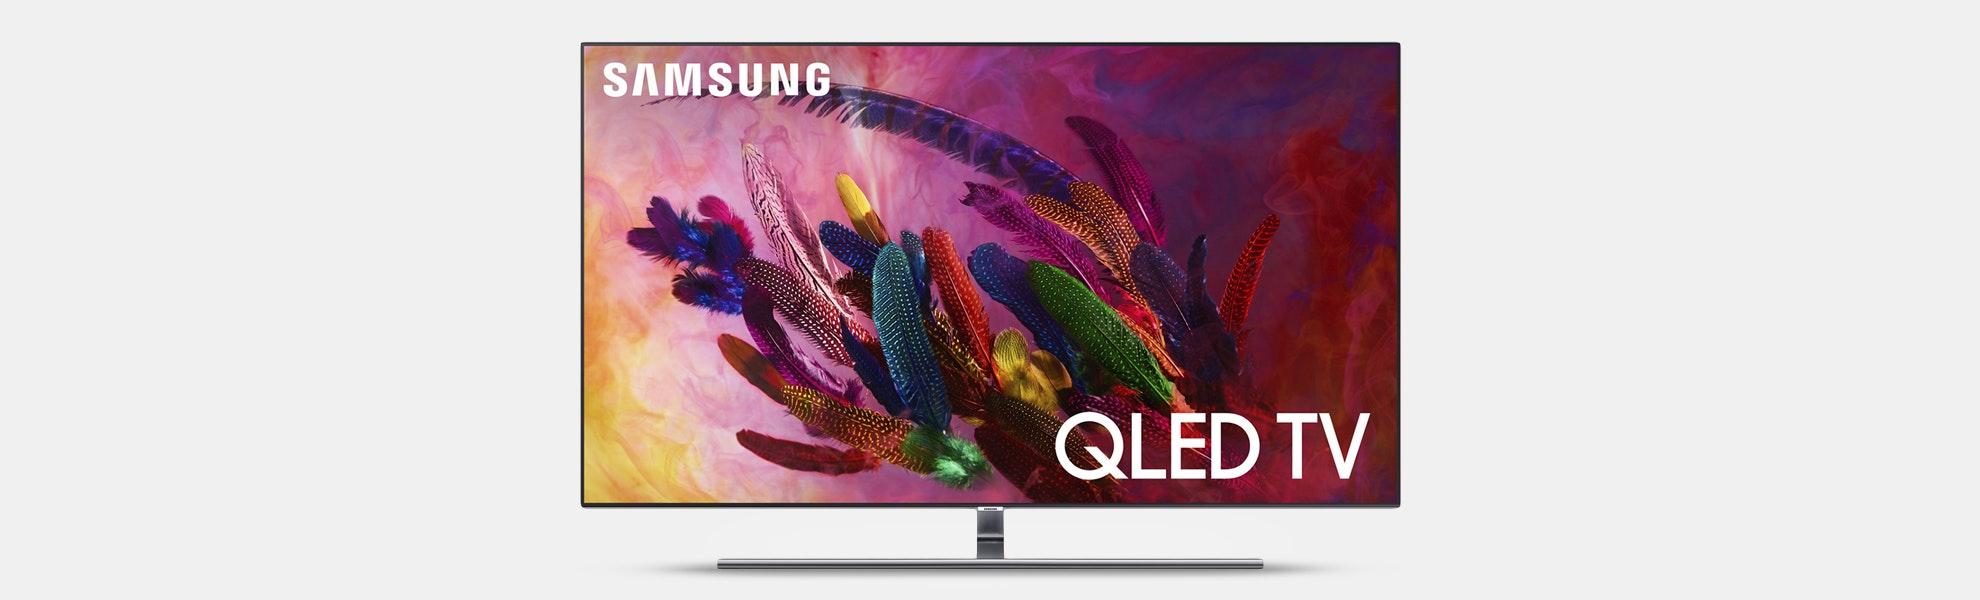 "Samsung 75"" Q7FN QLED Smart 4K UHD TV (2018)"